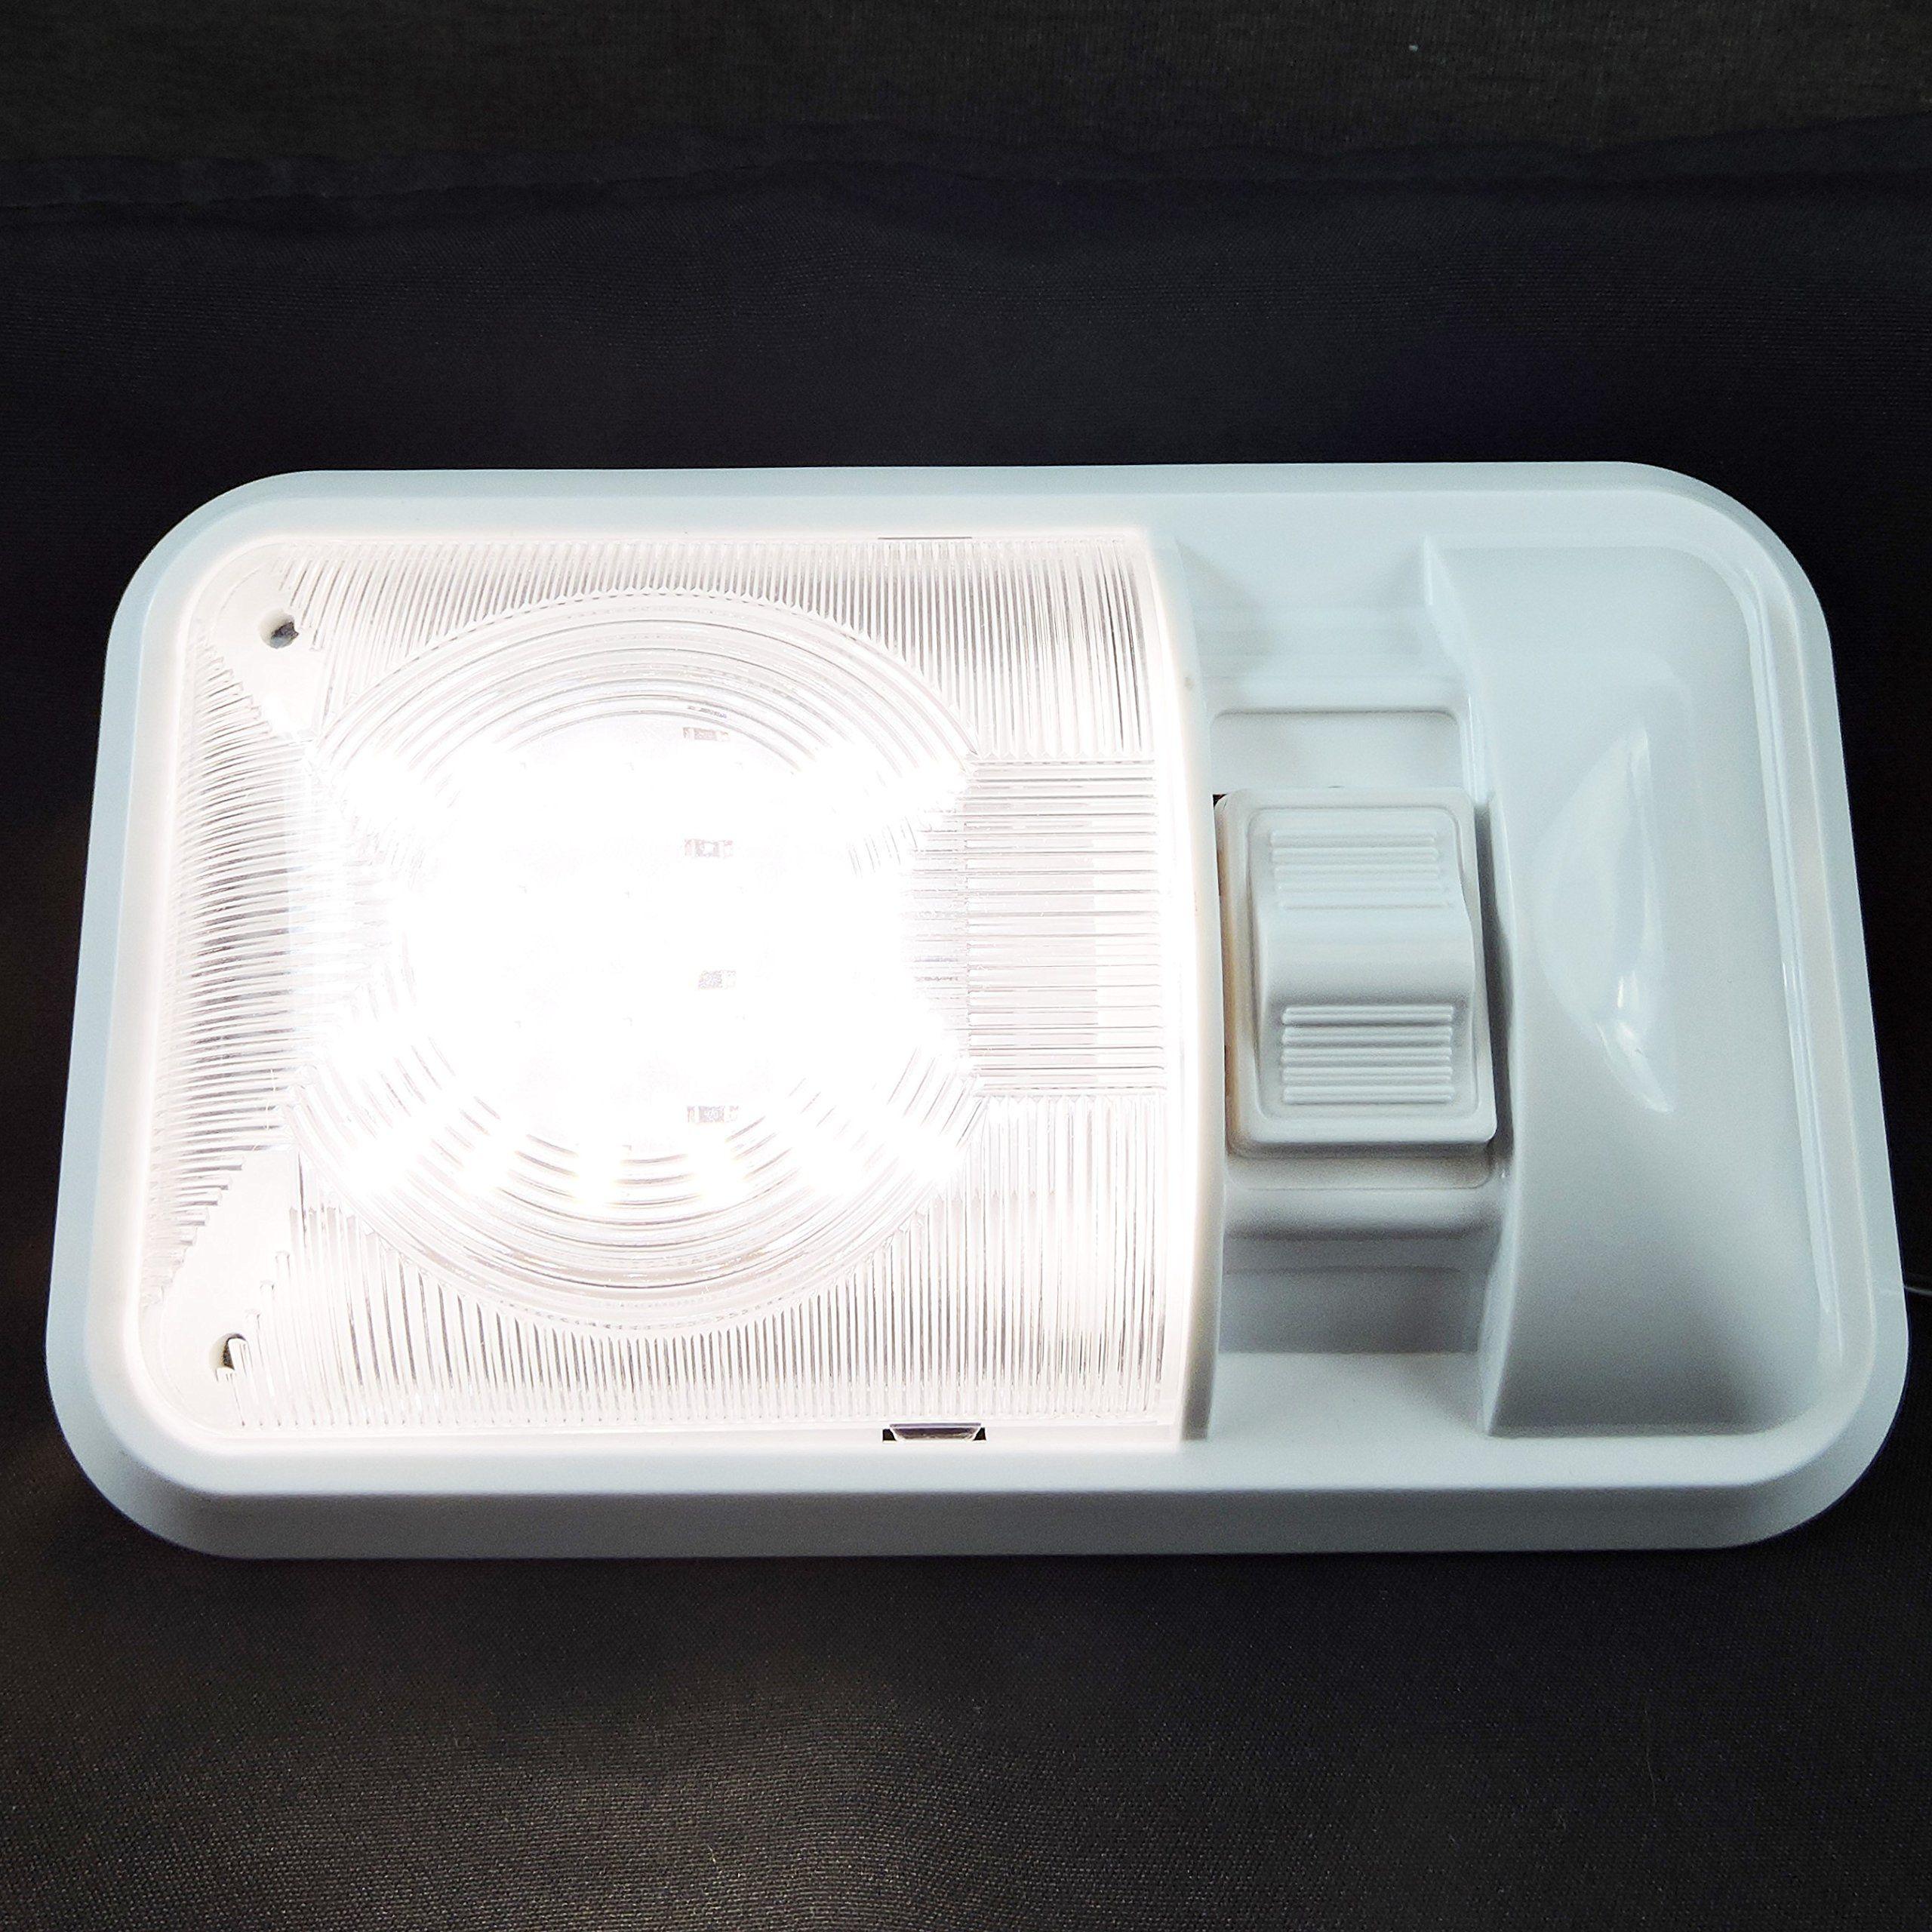 Leisure Led 2 Pack 12v Led Rv Ceiling Dome Light Rv Interior Lighting For Trailer Camper With Switch Single Dome Dome Lighting Interior Lighting Ceiling Domes